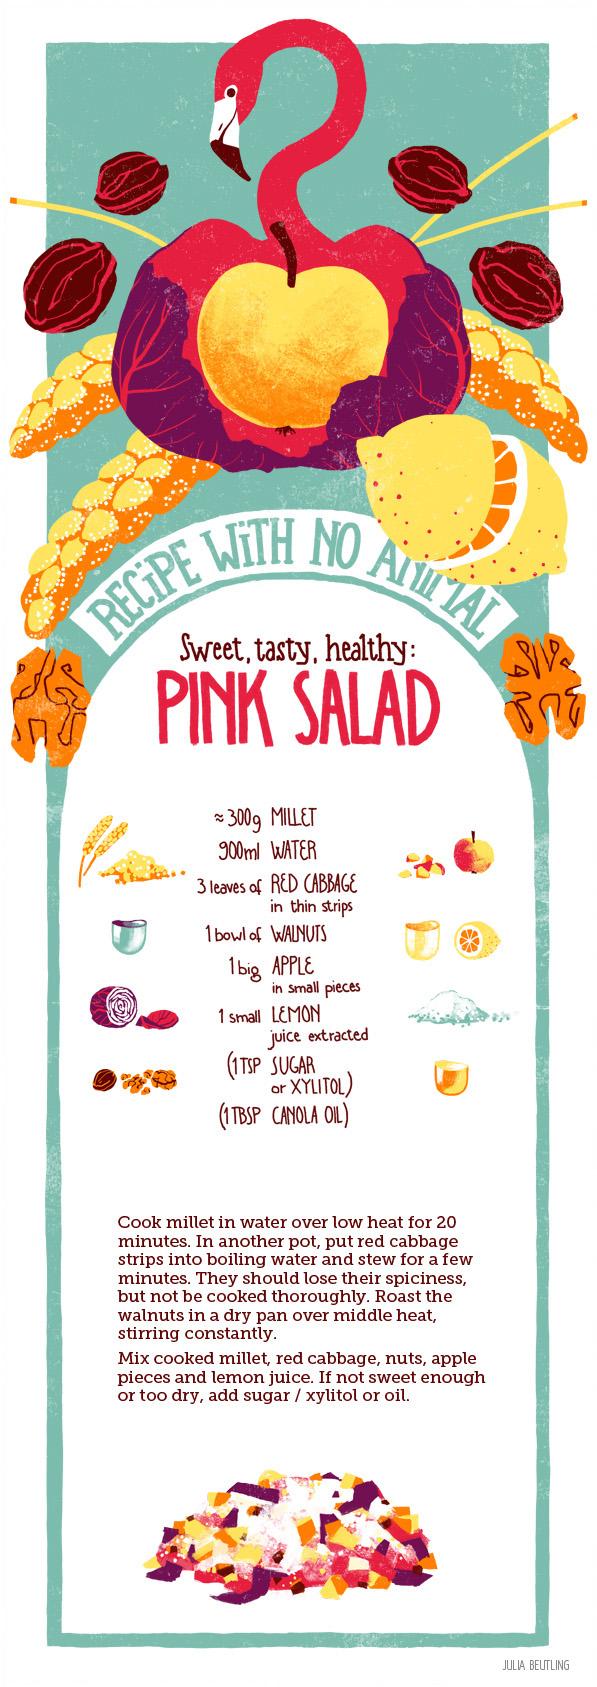 WEB rezept 3 EN pink salad B